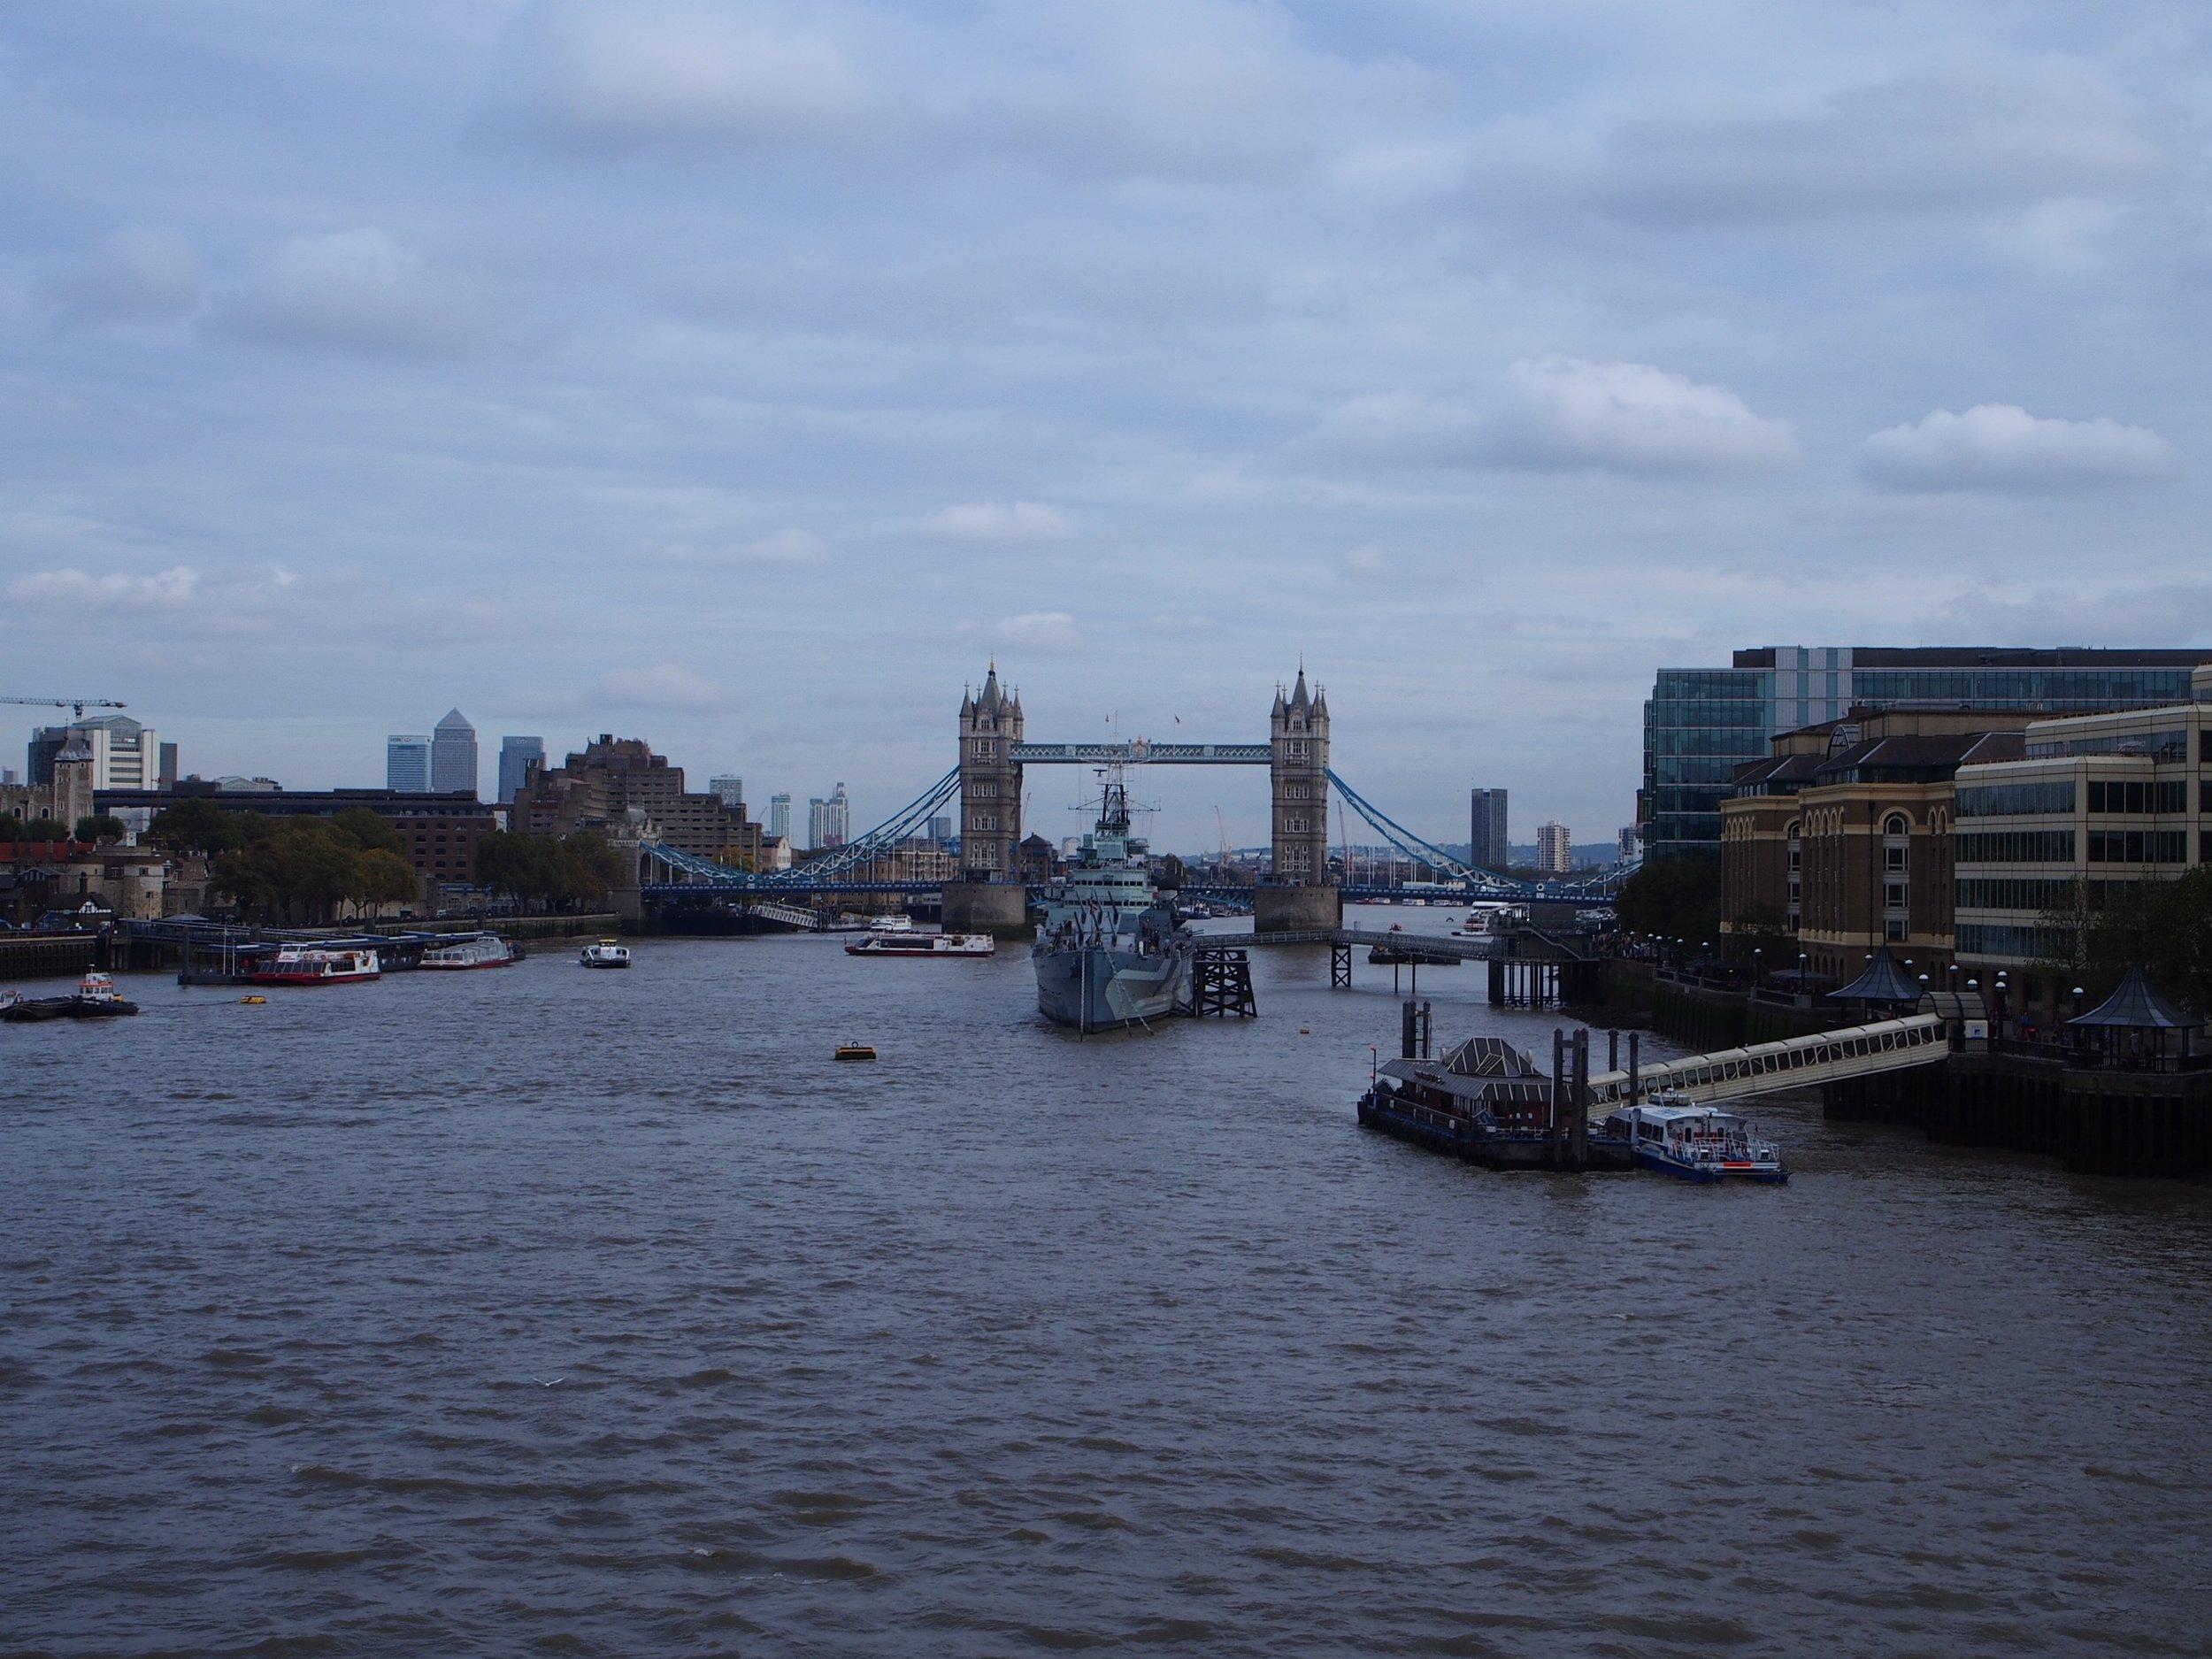 Blackfriars Bridge with a view of the Tower Bridge